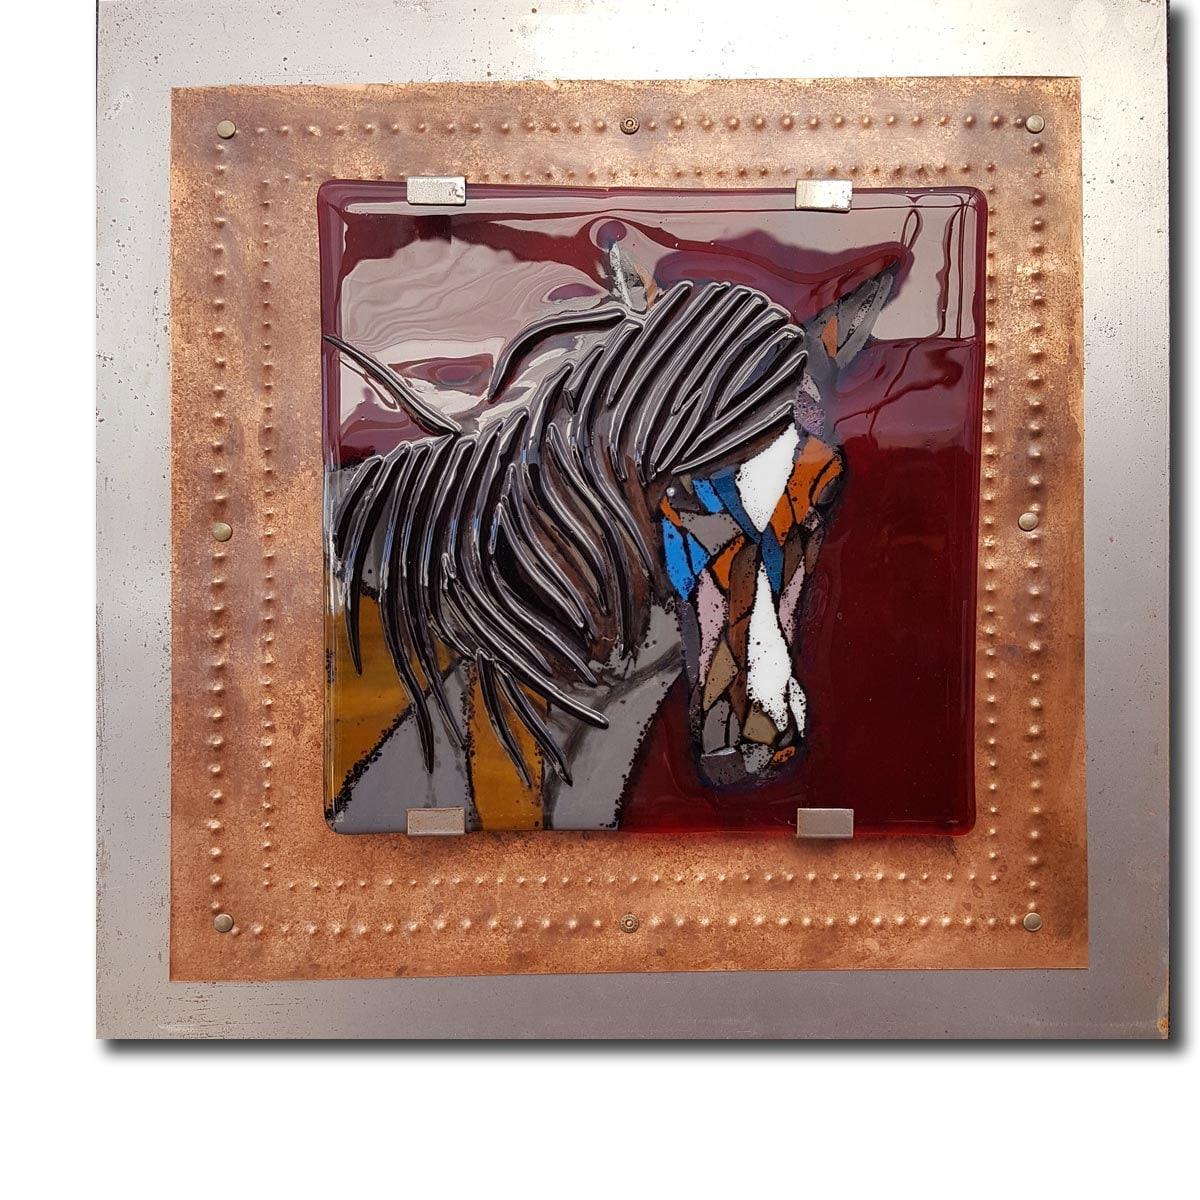 Fused Glass Wall Art: Calm Spirit Mosaic Horse Fused Glass Wall Art